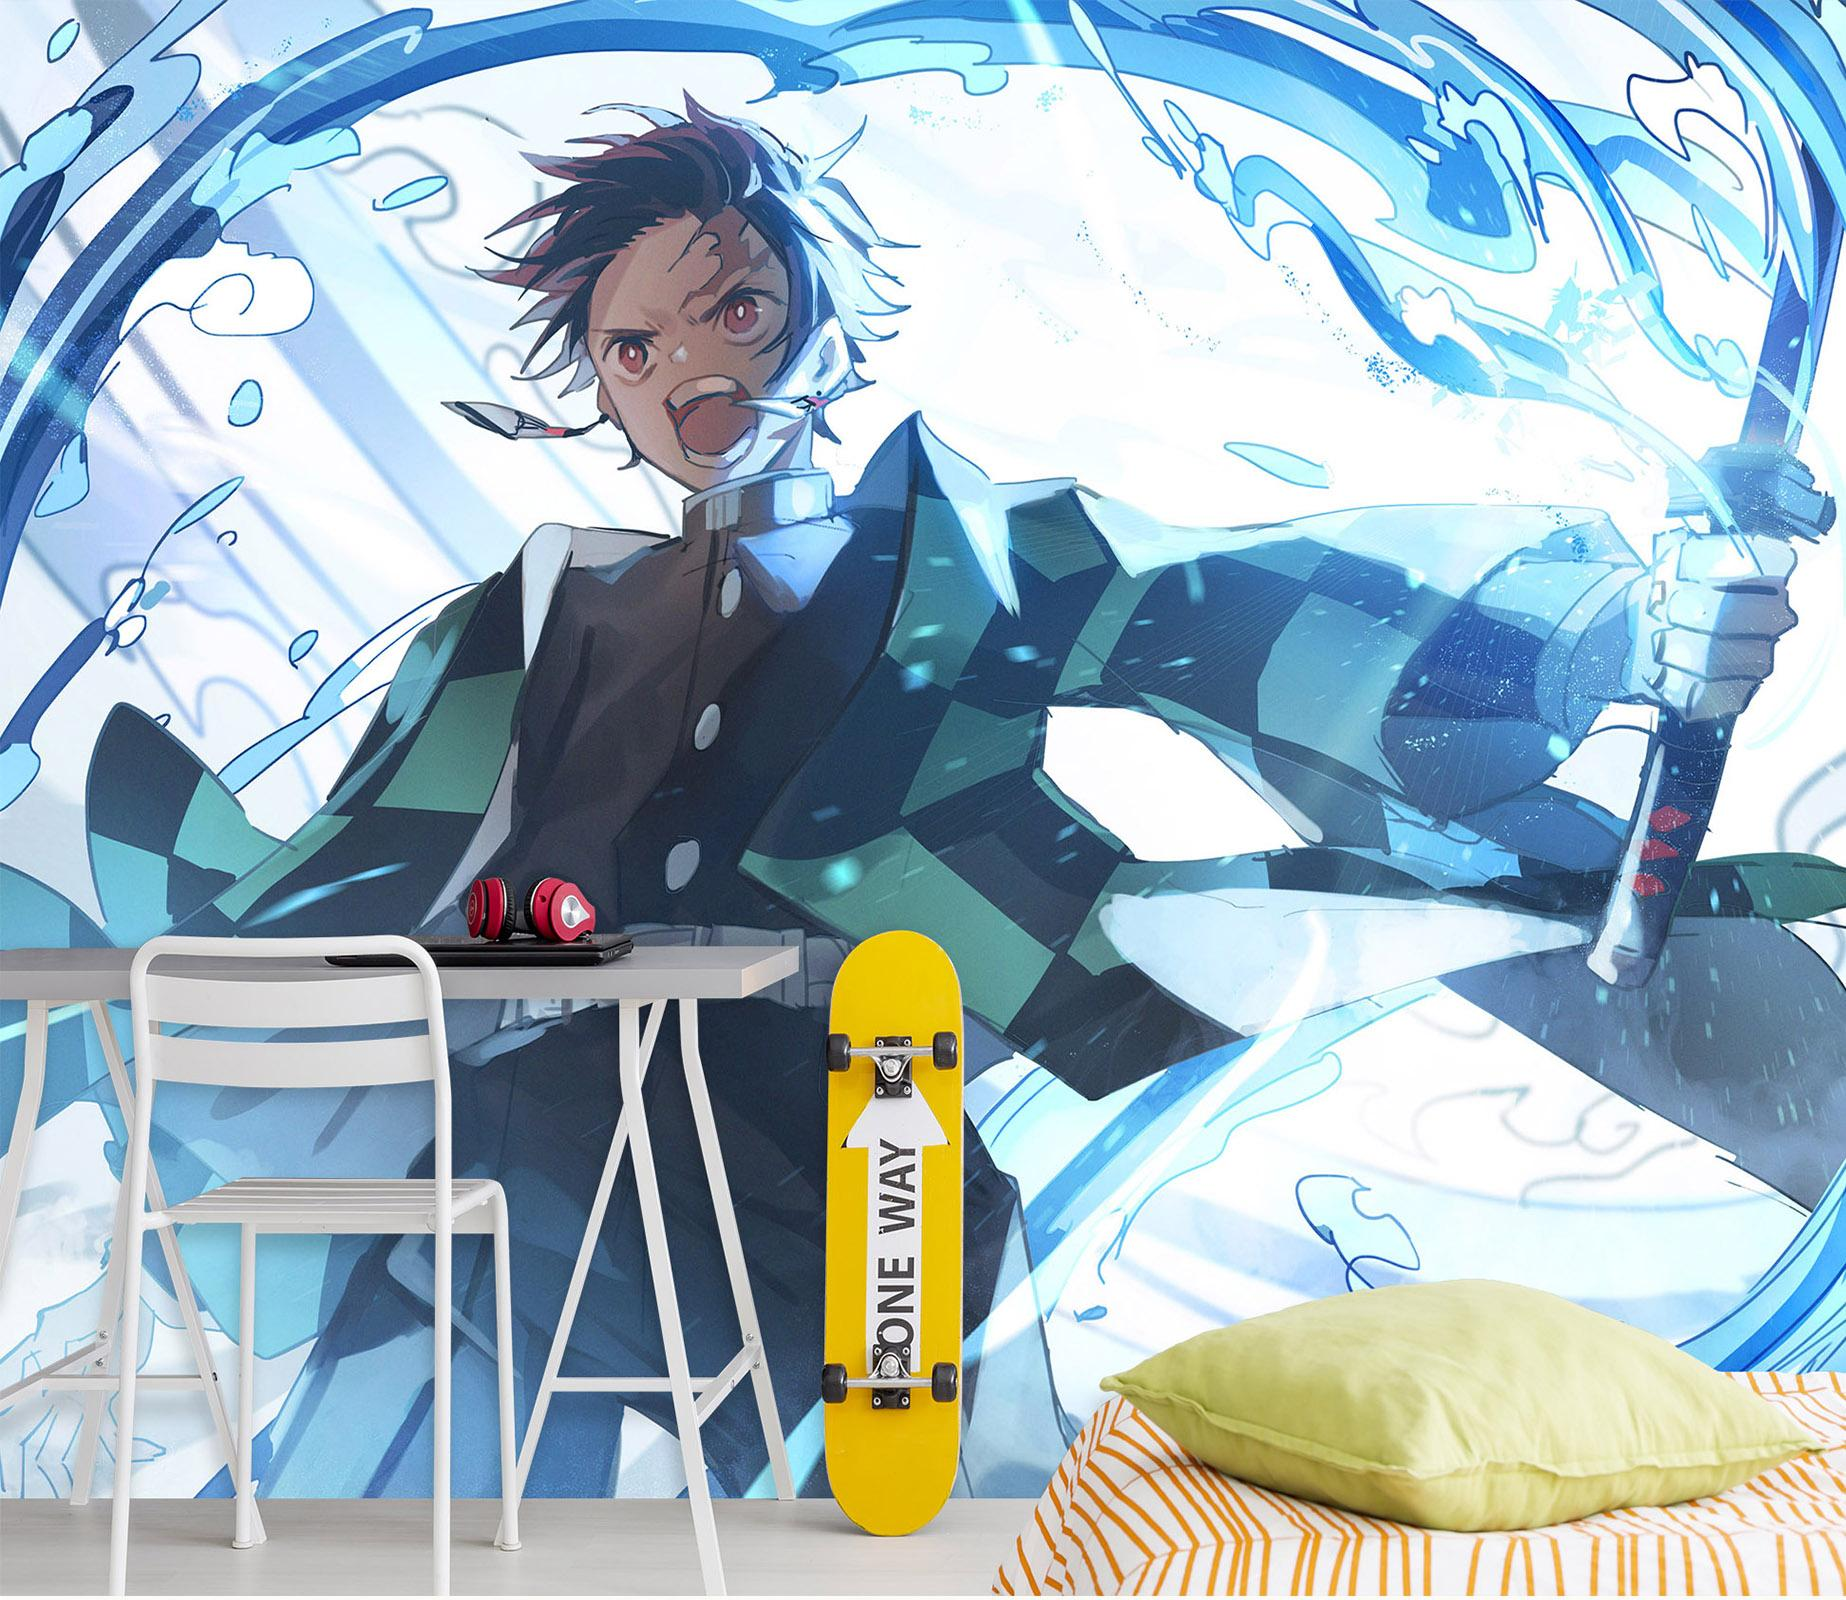 [Auto-adhésif] 3D Kimetsu No Yaiba 0250 mur murale papier mur Imprimer Decal Photo murales Muzi